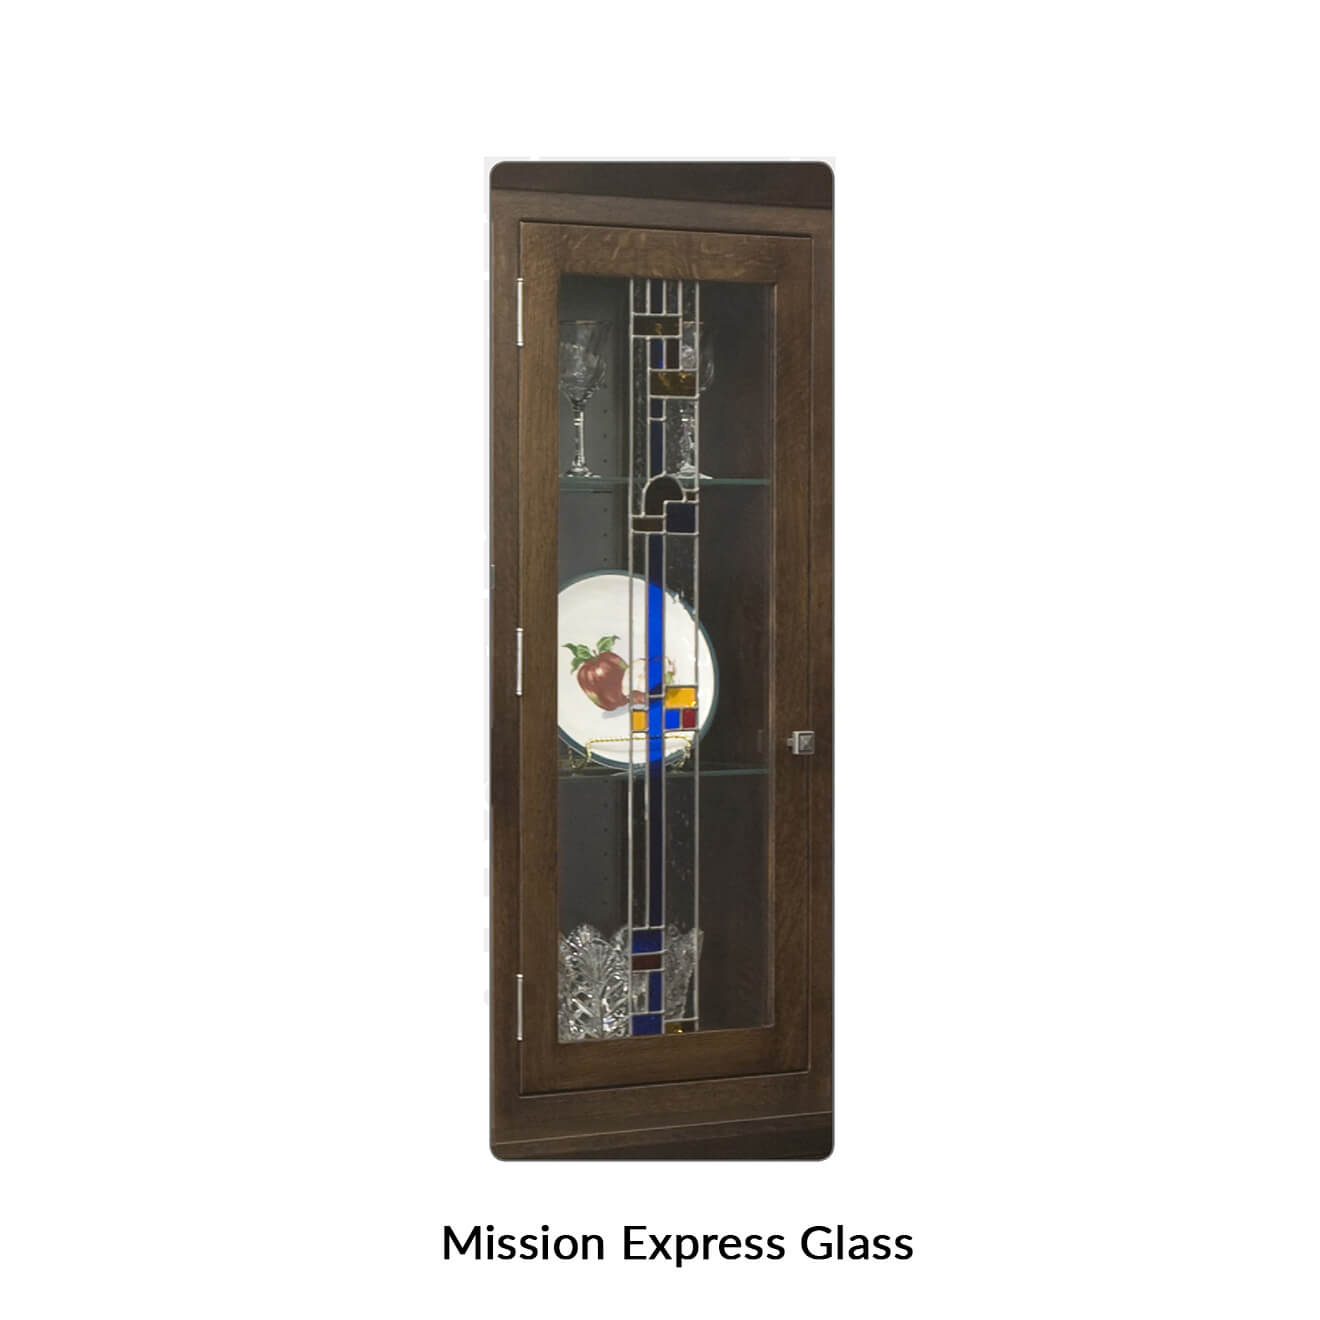 8-tf-mission-express-glass.jpg